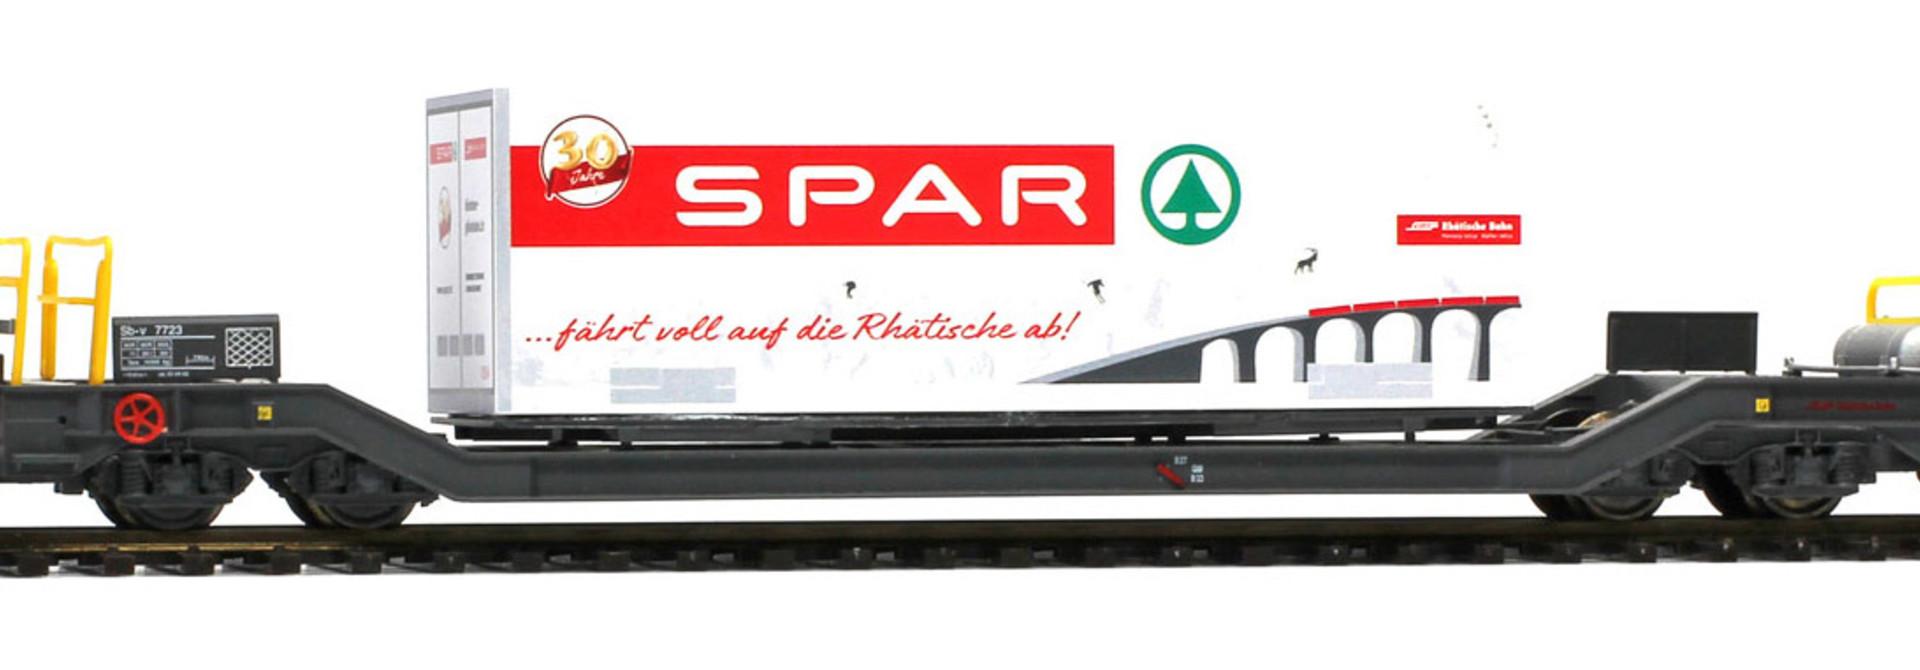 "2289118 RhB Sb-v 7728 mit Container ""Spar Berge"" 125 A"